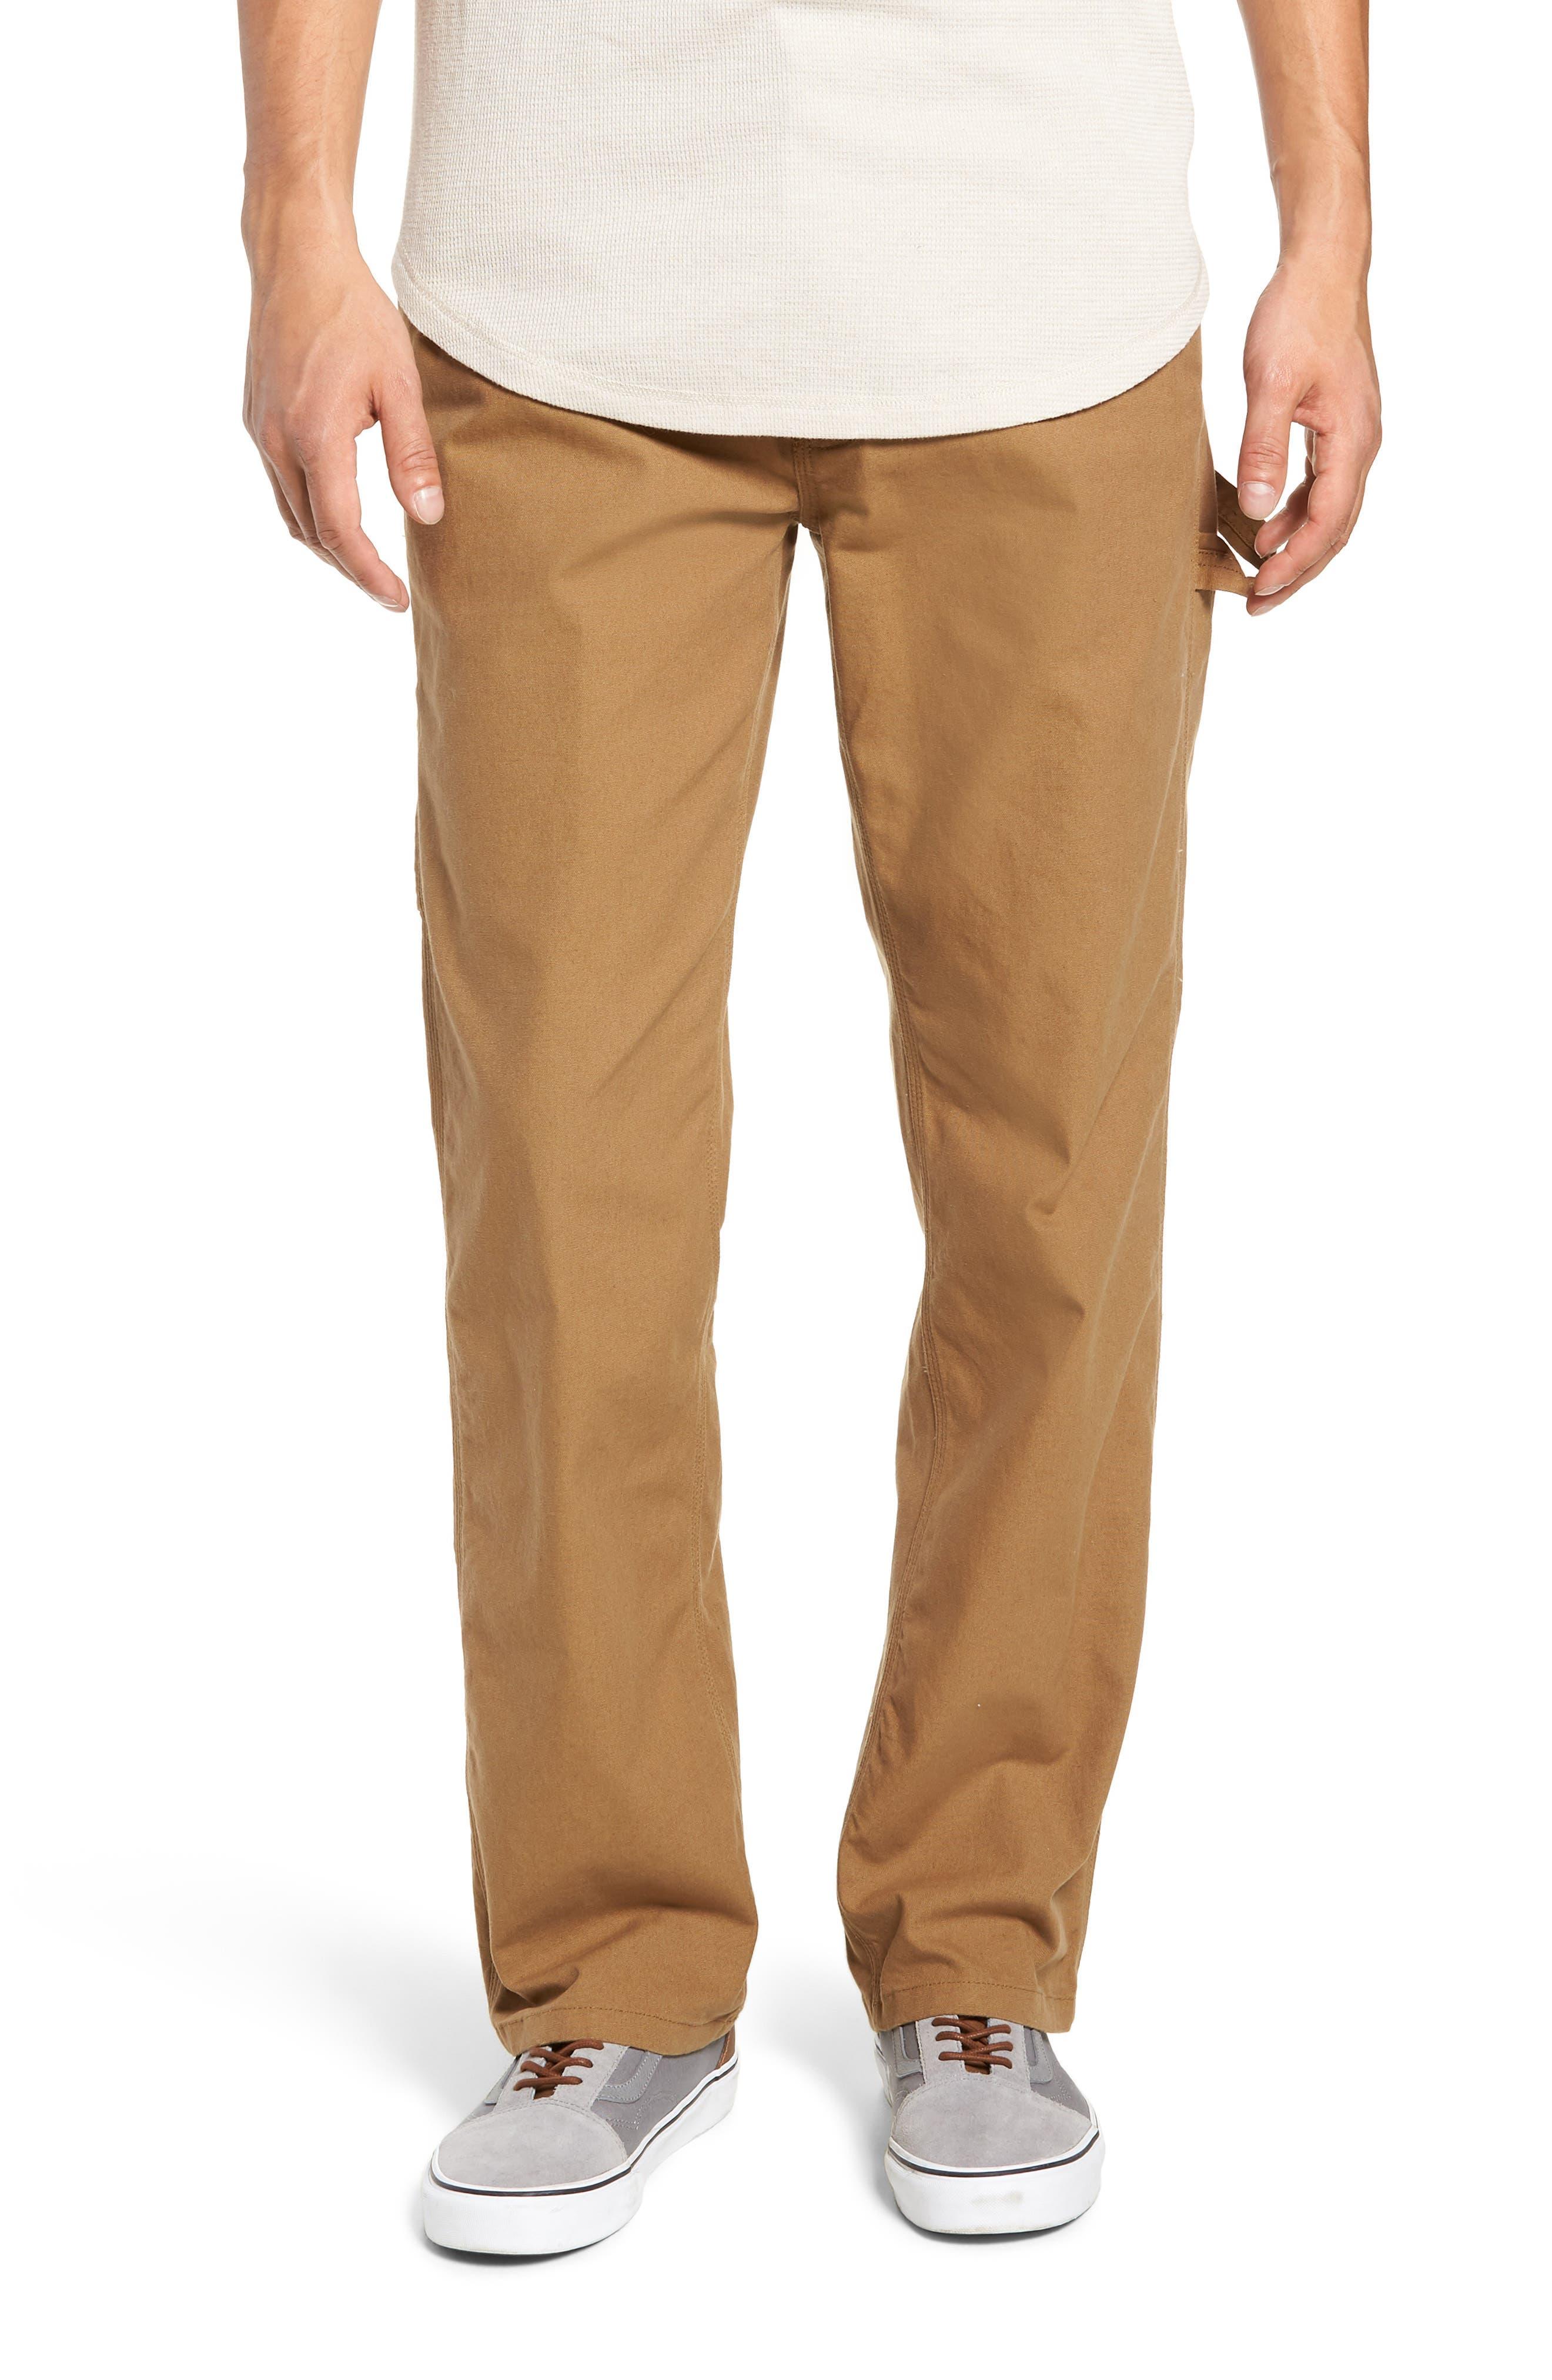 Hardware Straight Fit Carpenter Pants,                             Main thumbnail 1, color,                             DIRT